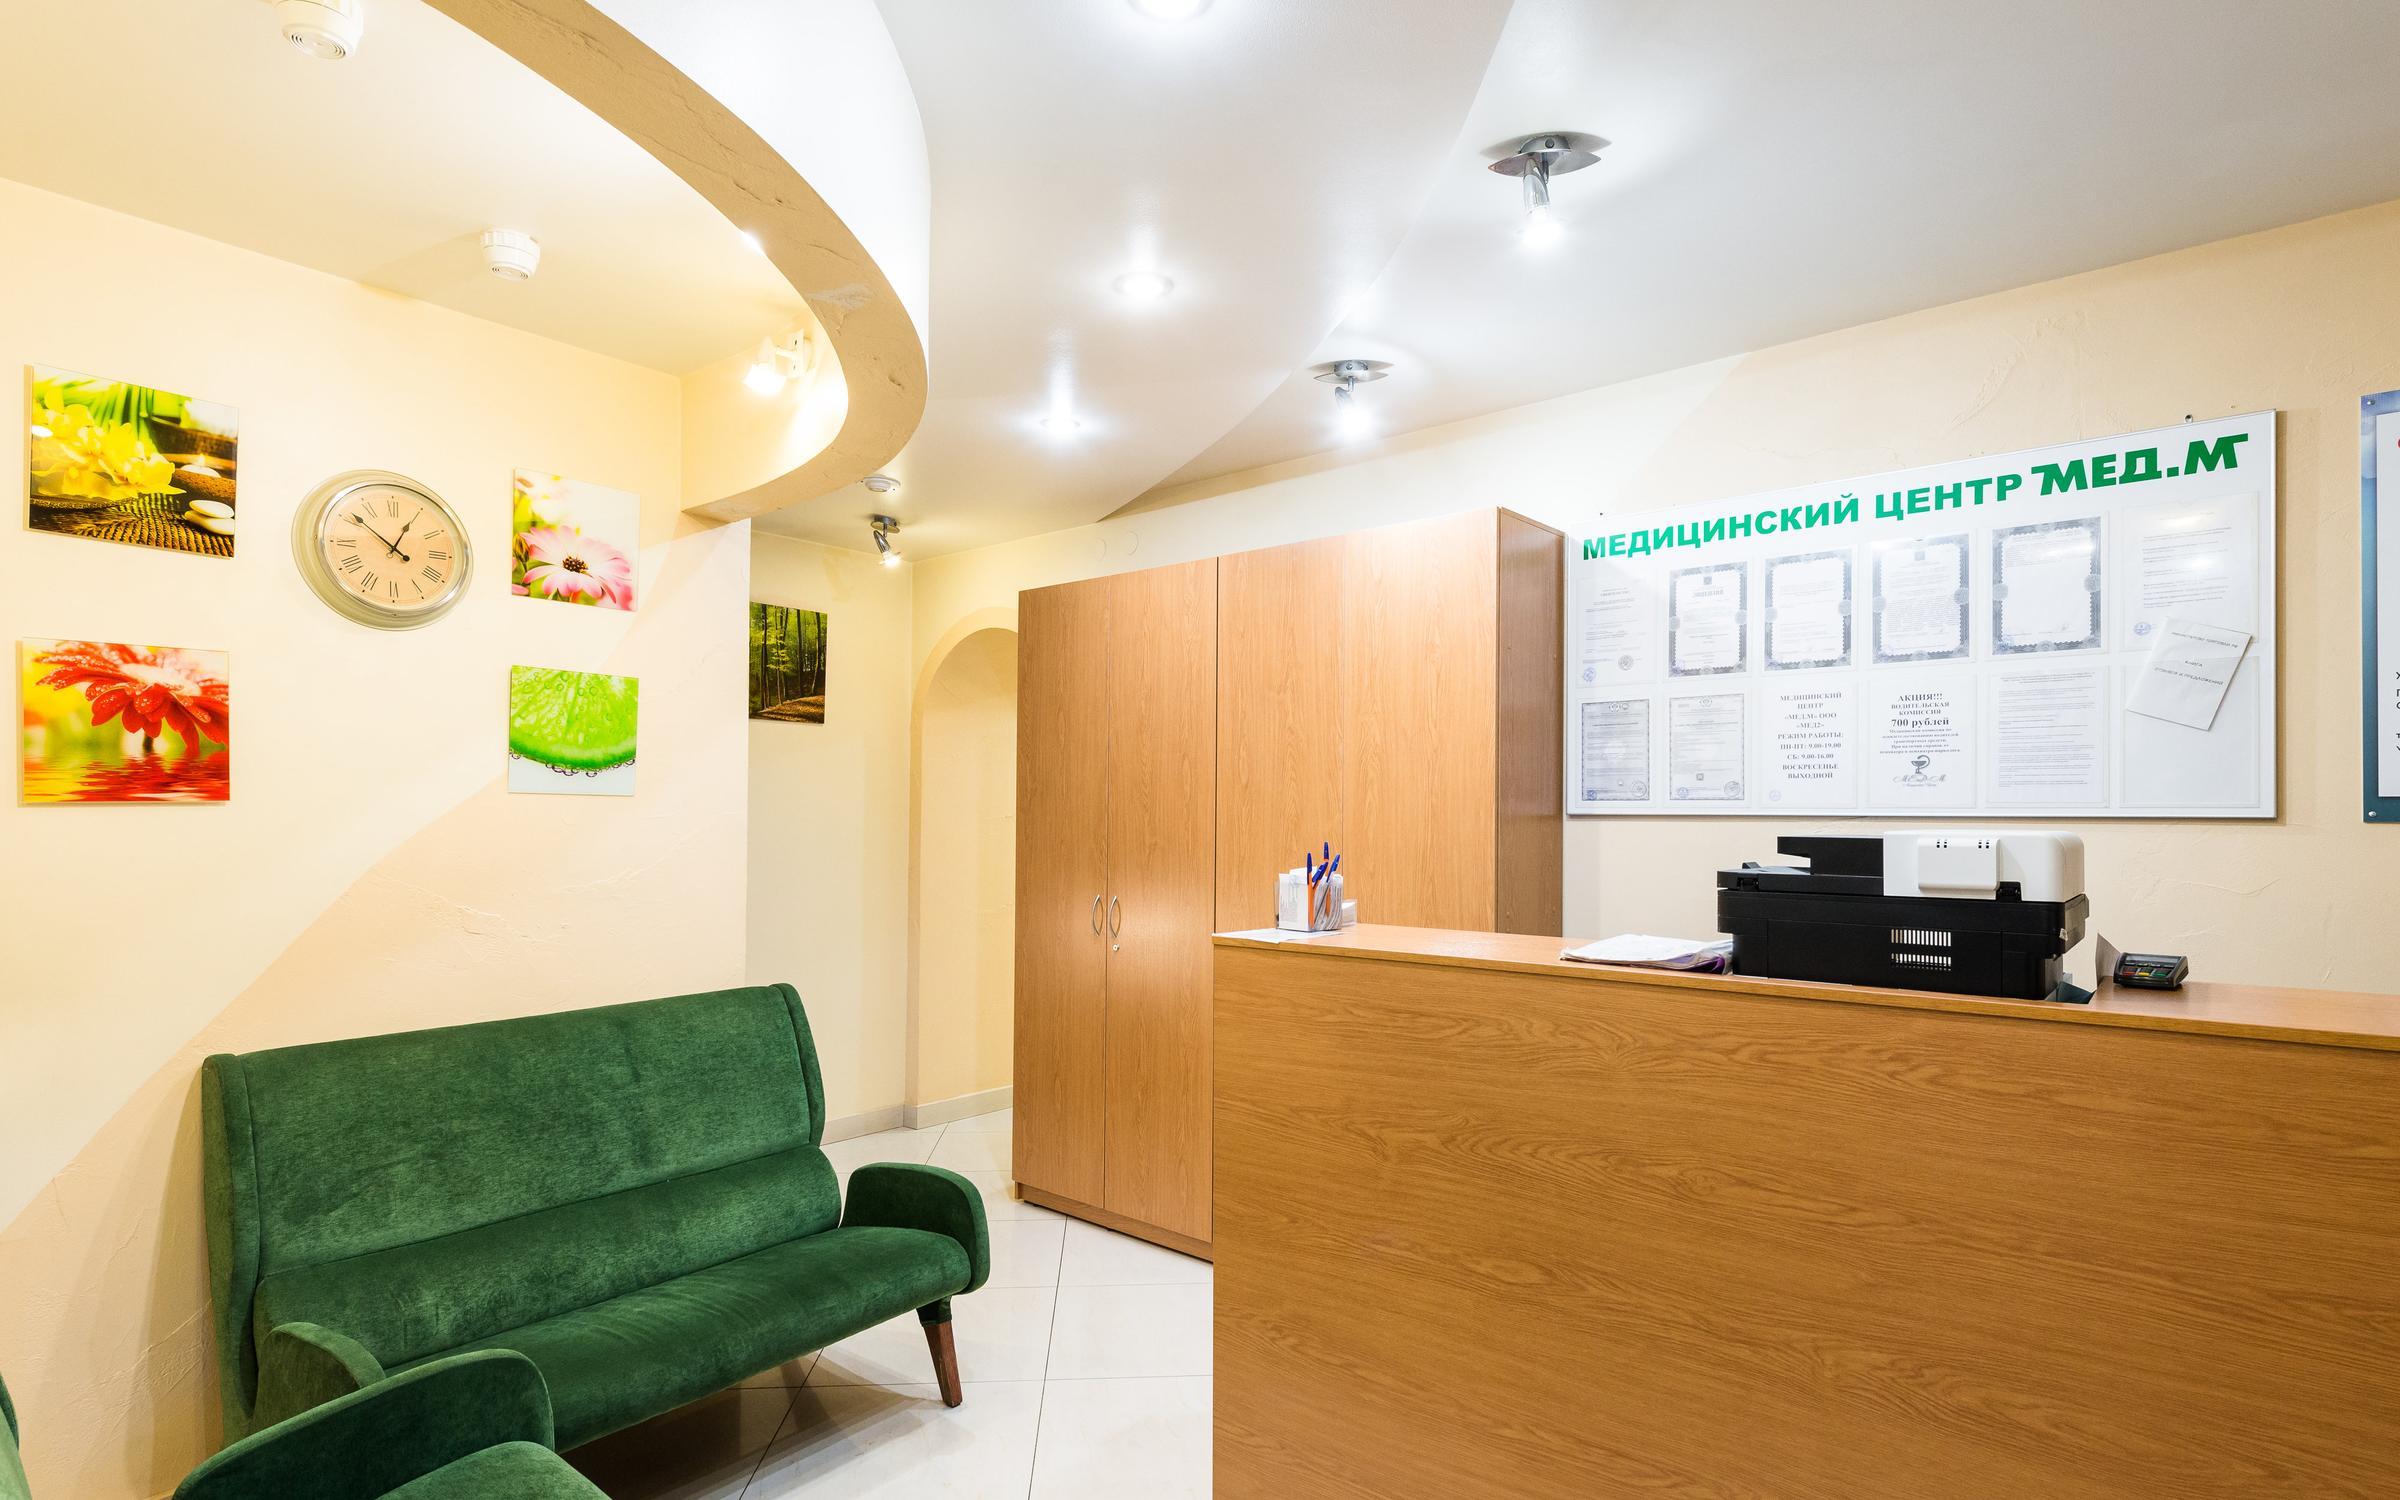 фотография Медицинского центра Мед-М на метро Площадь Восстания